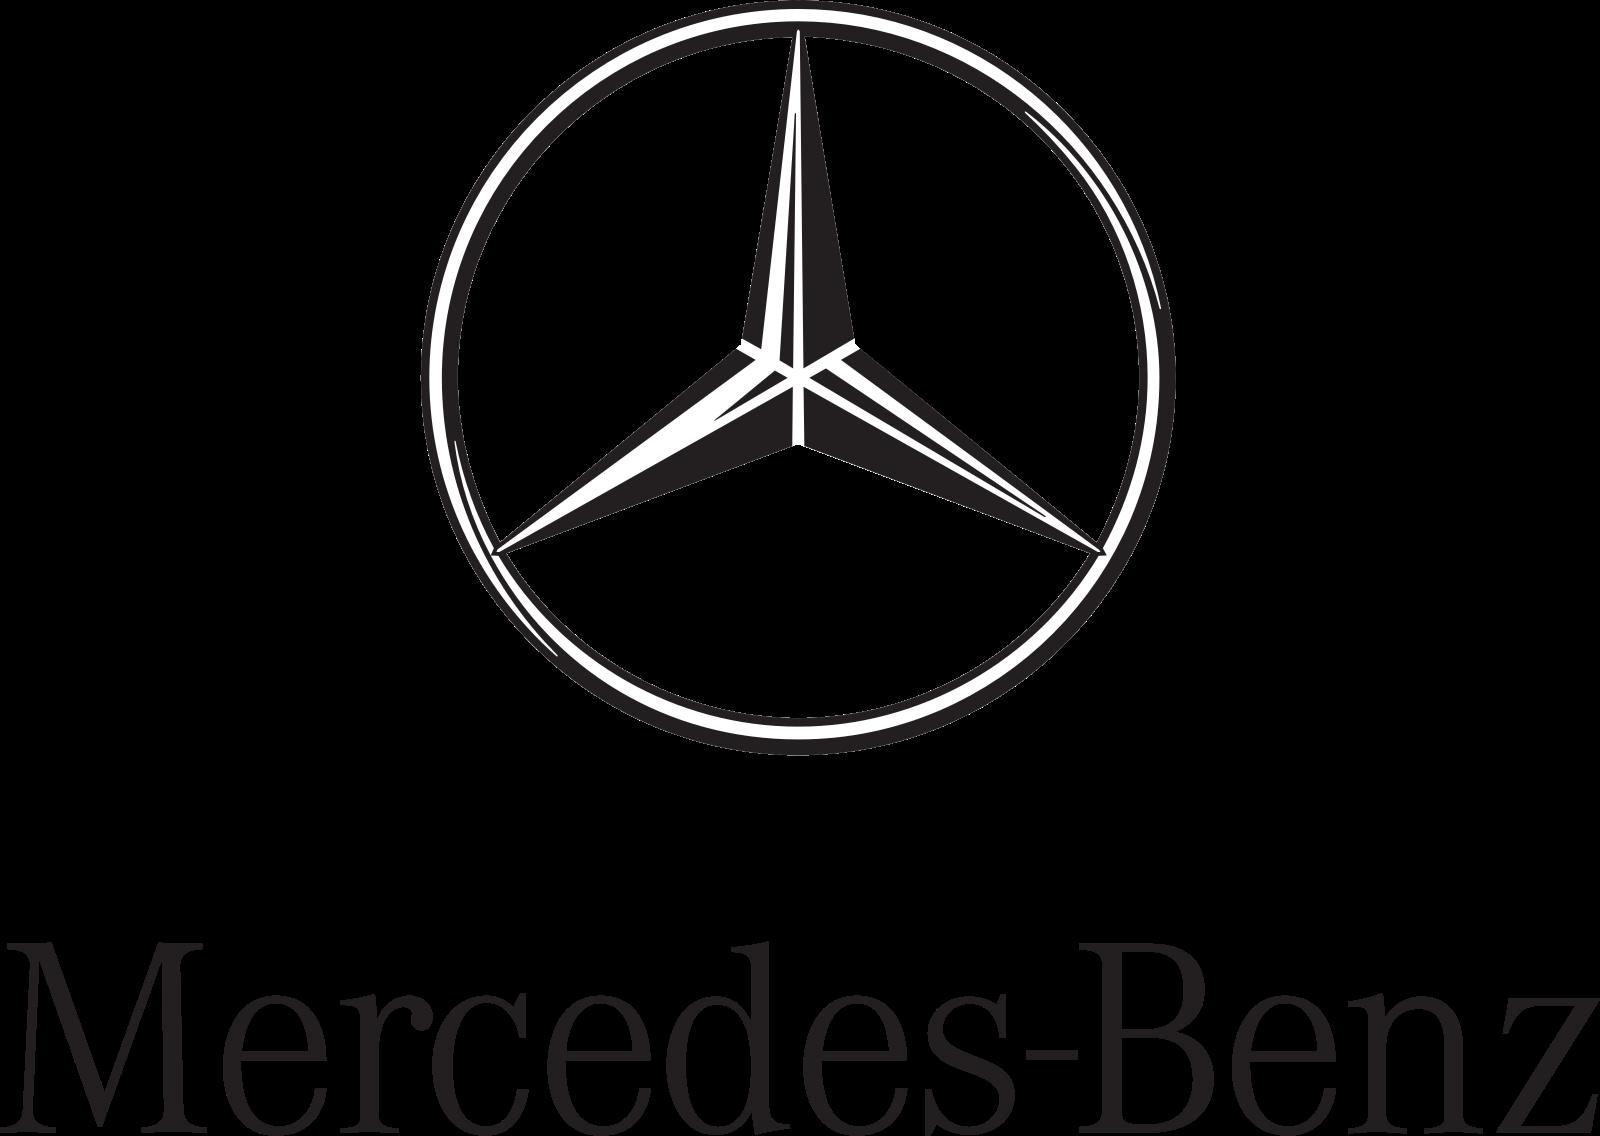 Mercedes-Benz Danmark A/S